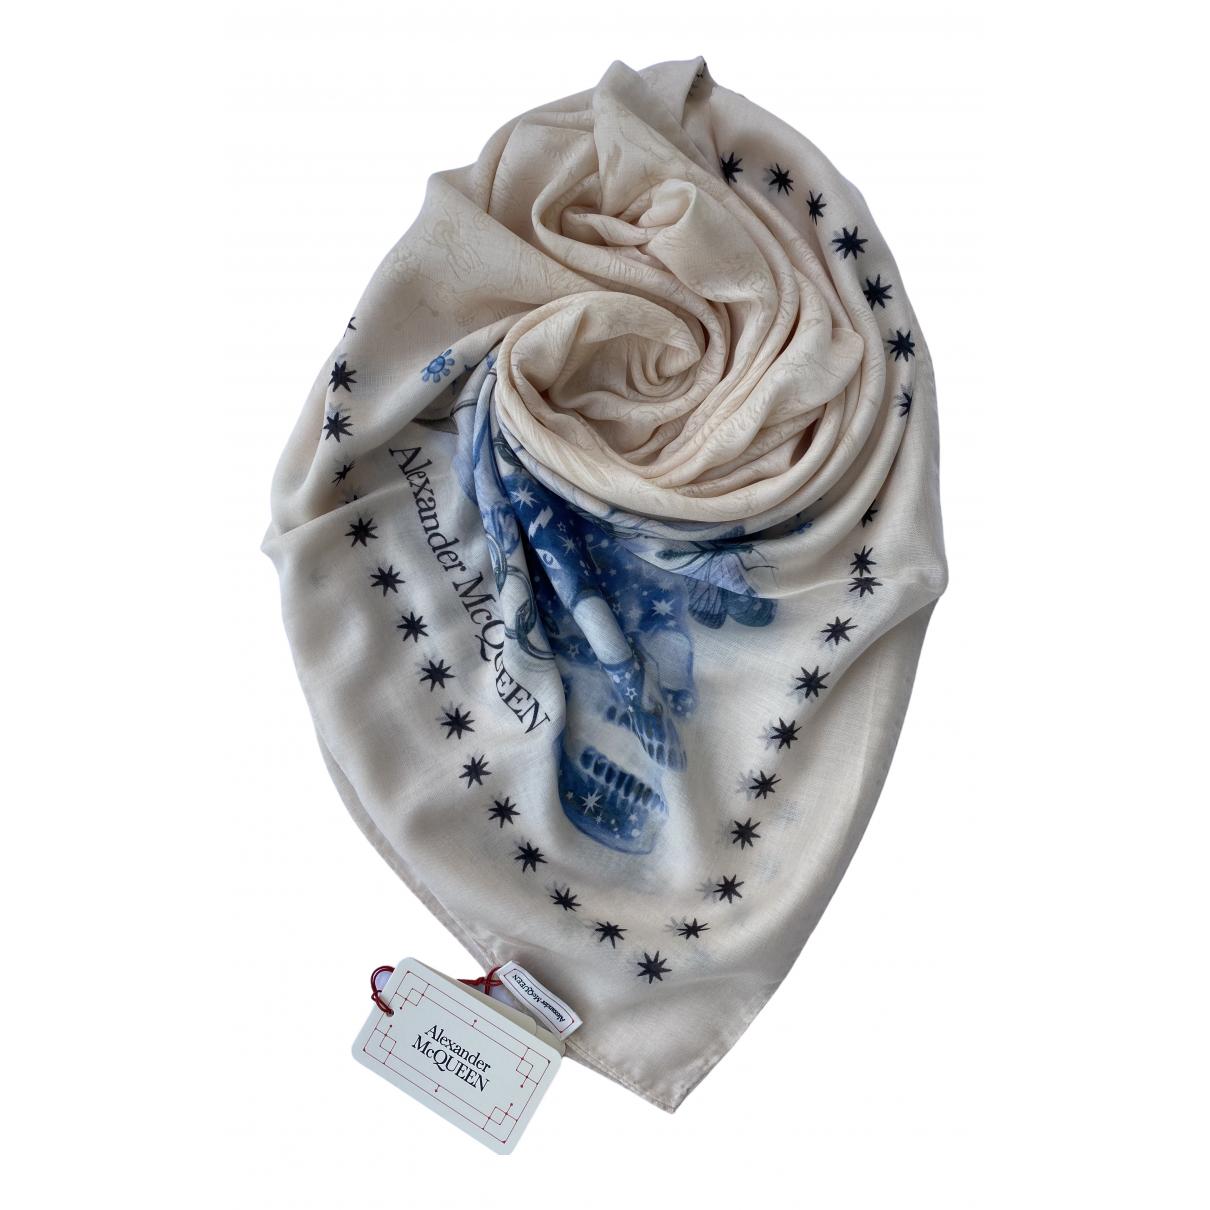 Alexander Mcqueen N scarf for Women N